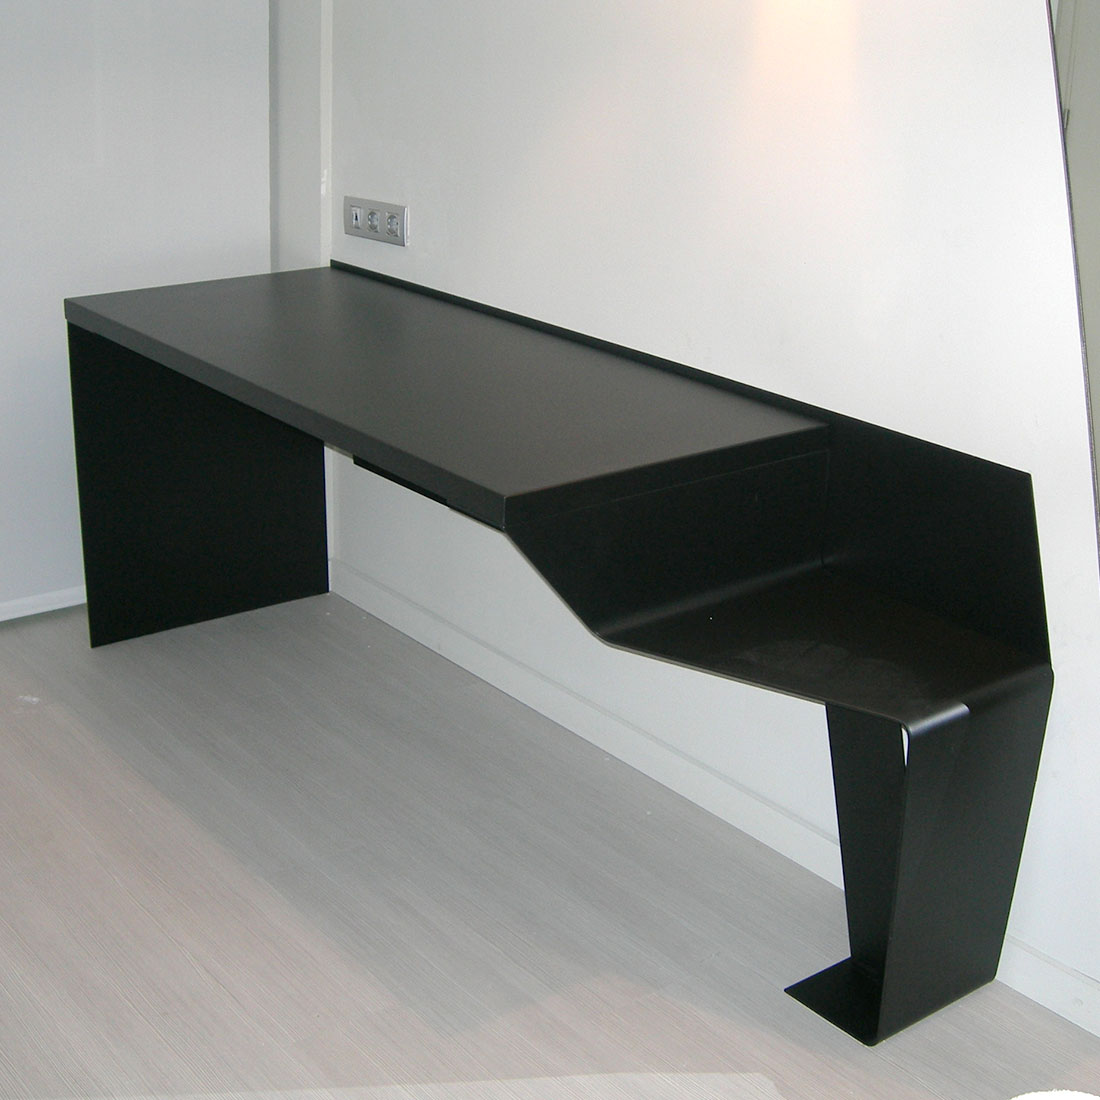 mesas de acero -fugrup-hotel-rosello-decoracion-mesa-habitacion_03